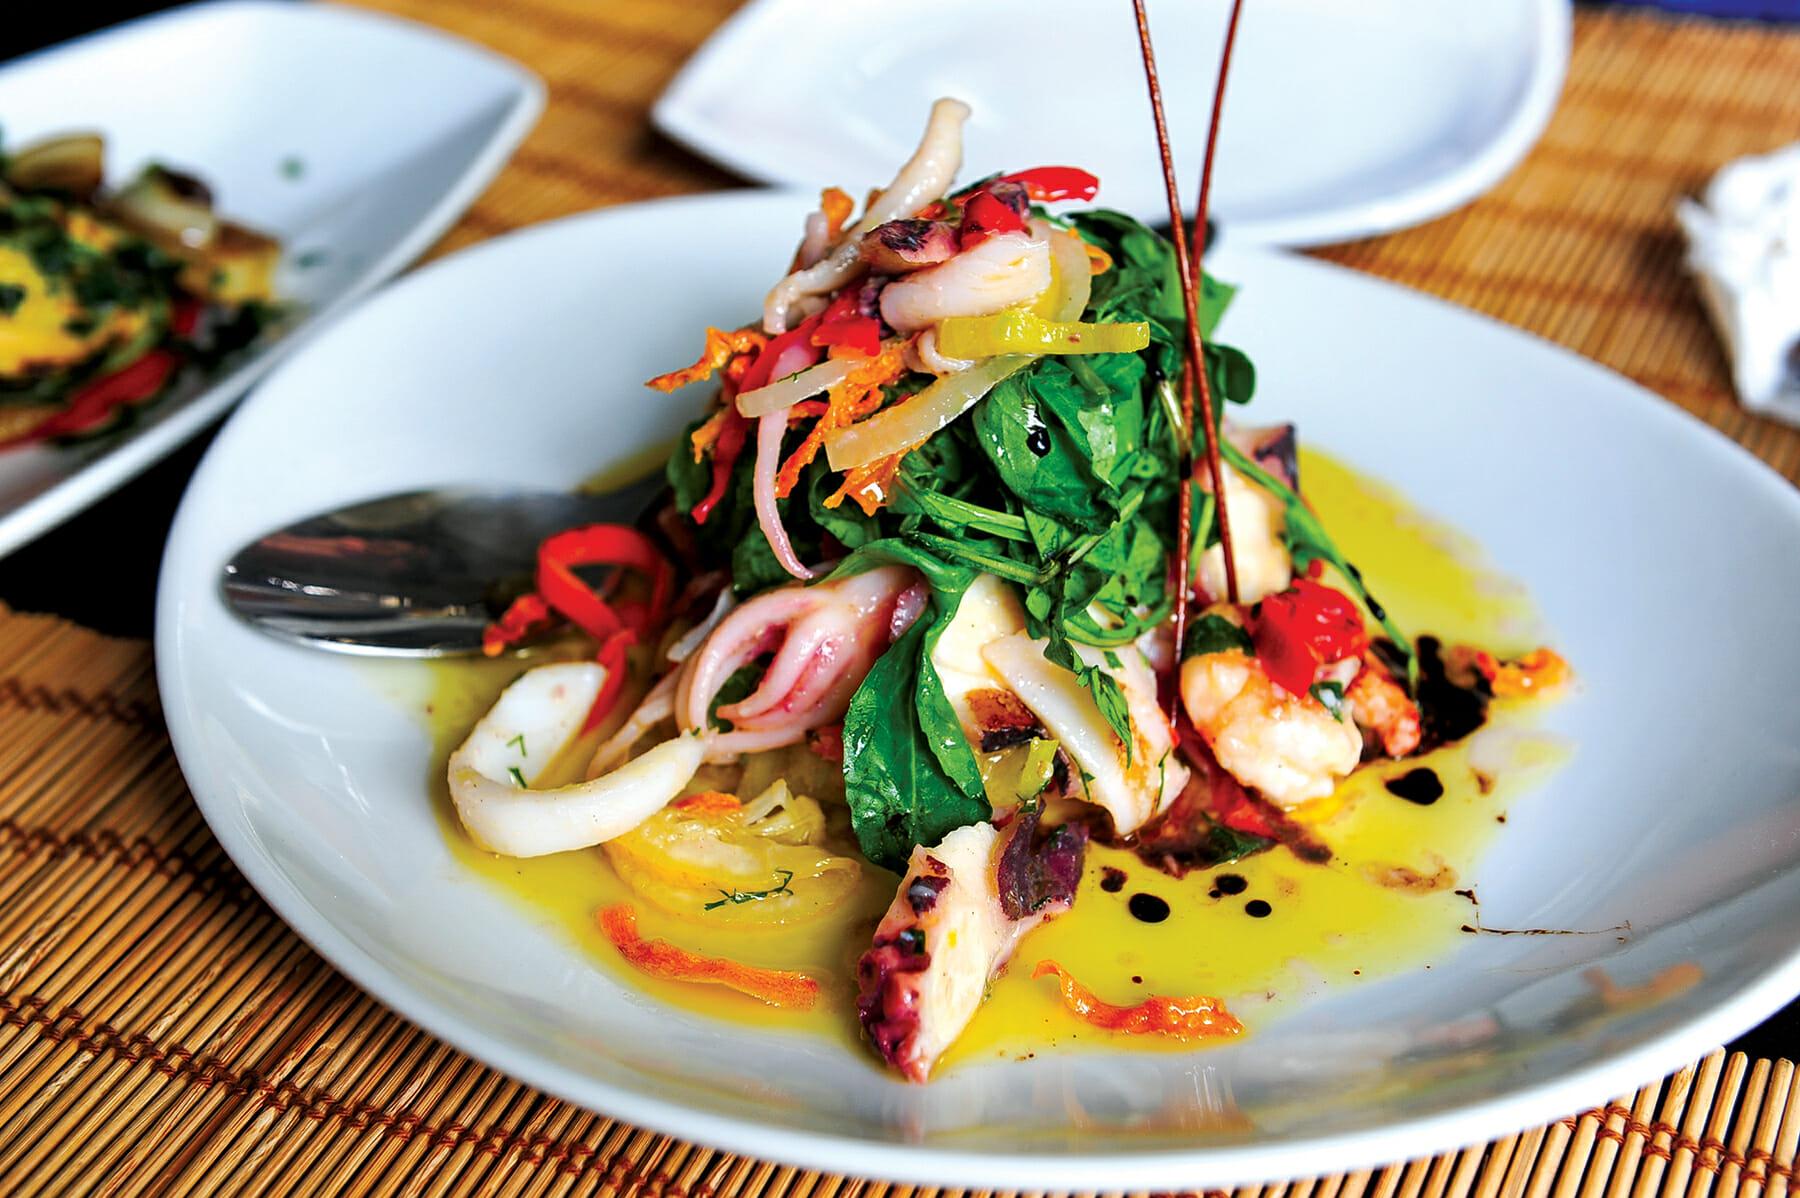 An Adriatic seafood salad (squid, octopus, shrimp, mussels) at Artigiano restaurant in Tirana's fashionable Ish-Blloku neighborhood. / Courtesy Merlin Bakus.